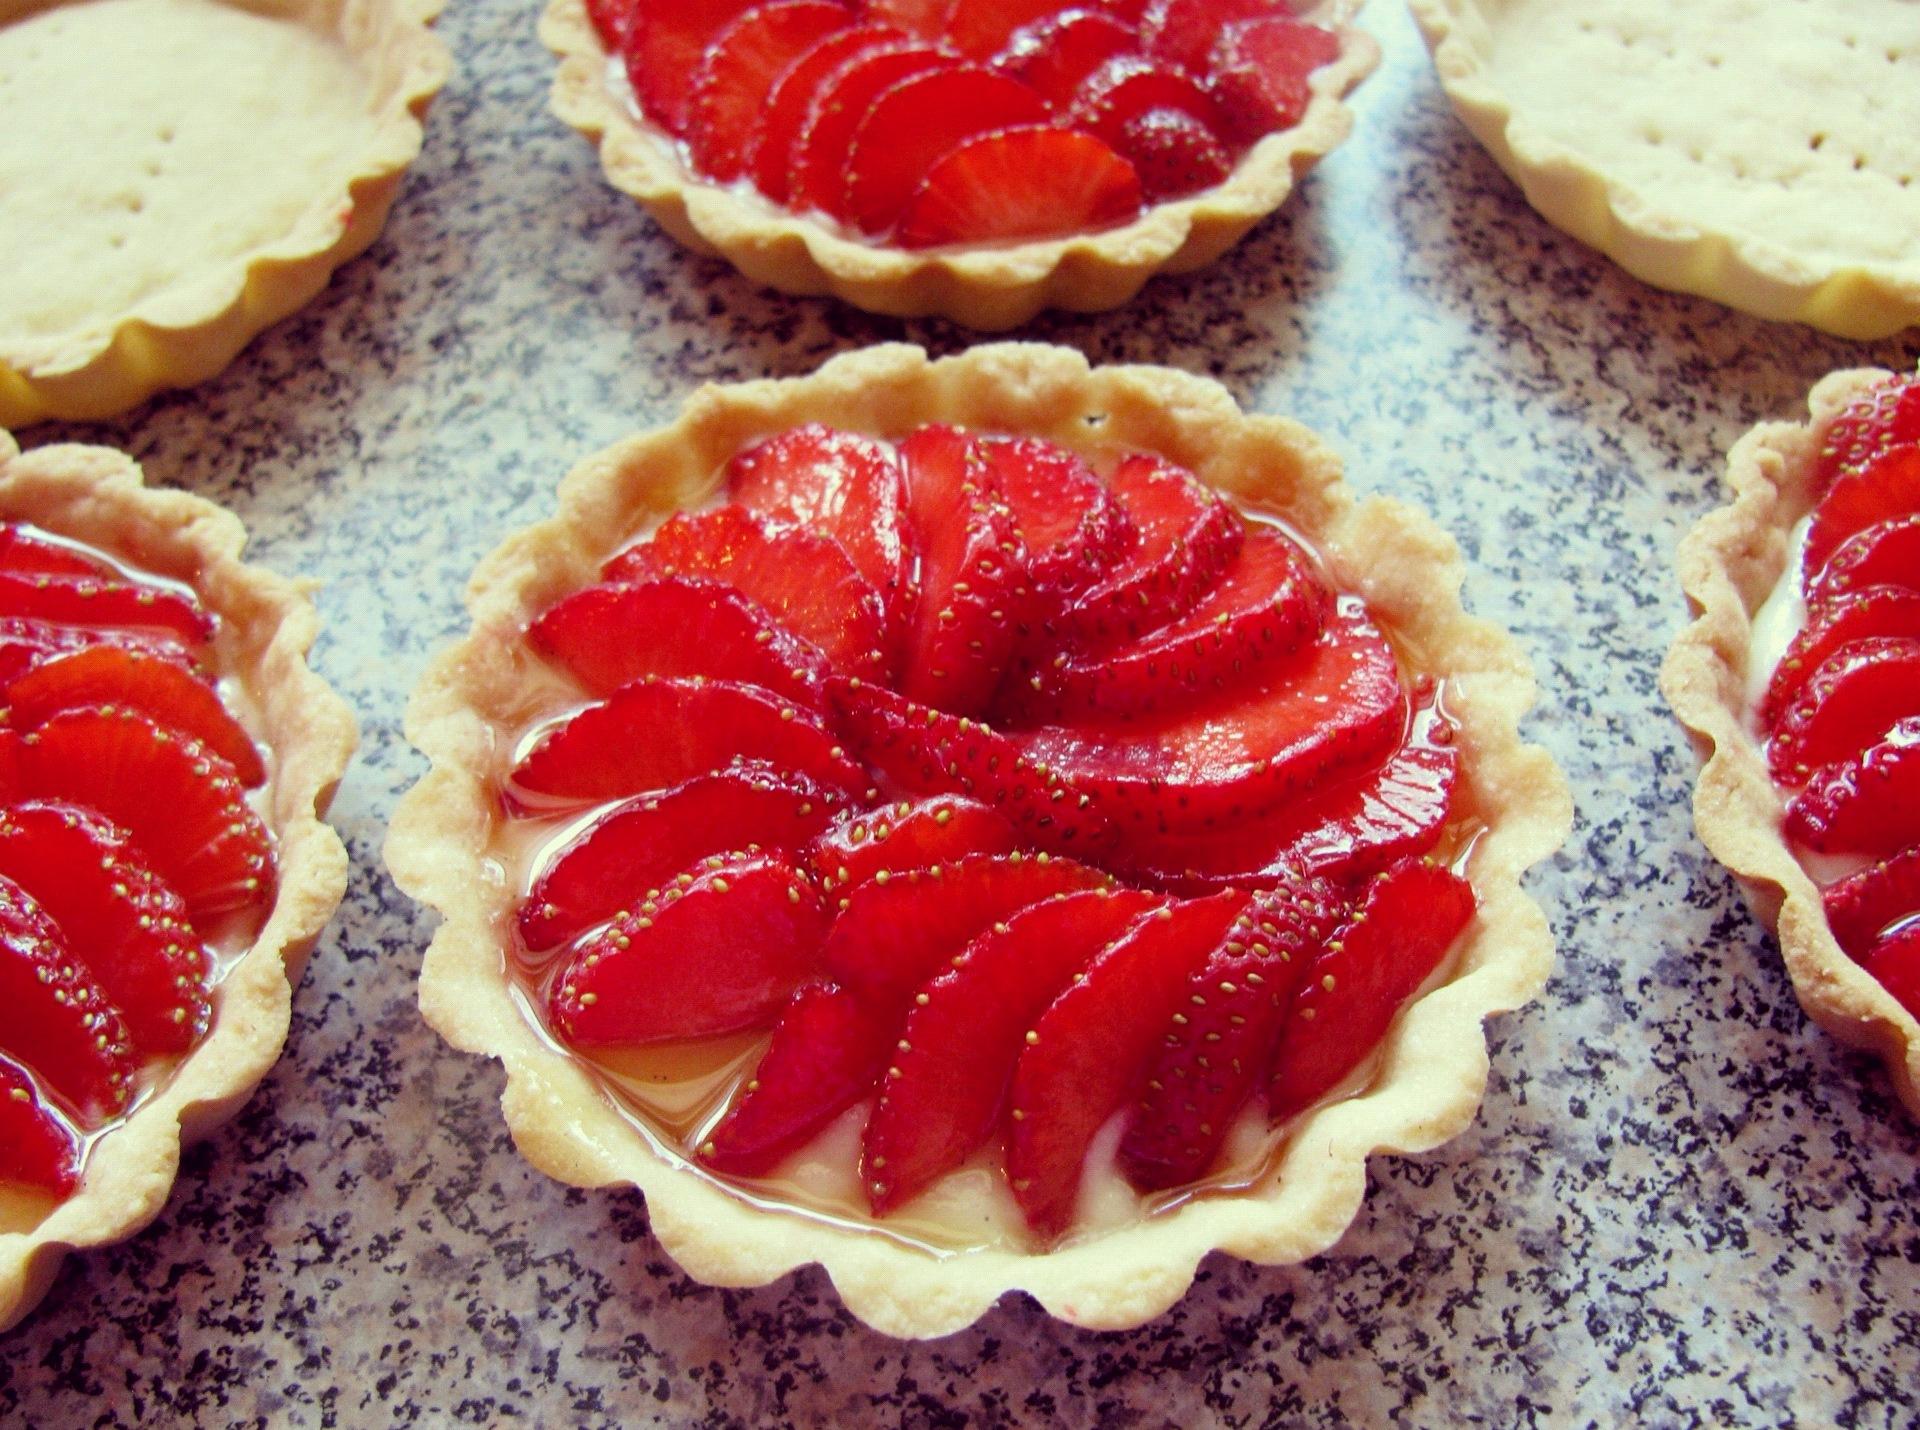 Strawberry Tart Pastry Cream Strawberry Tarts With Pastry